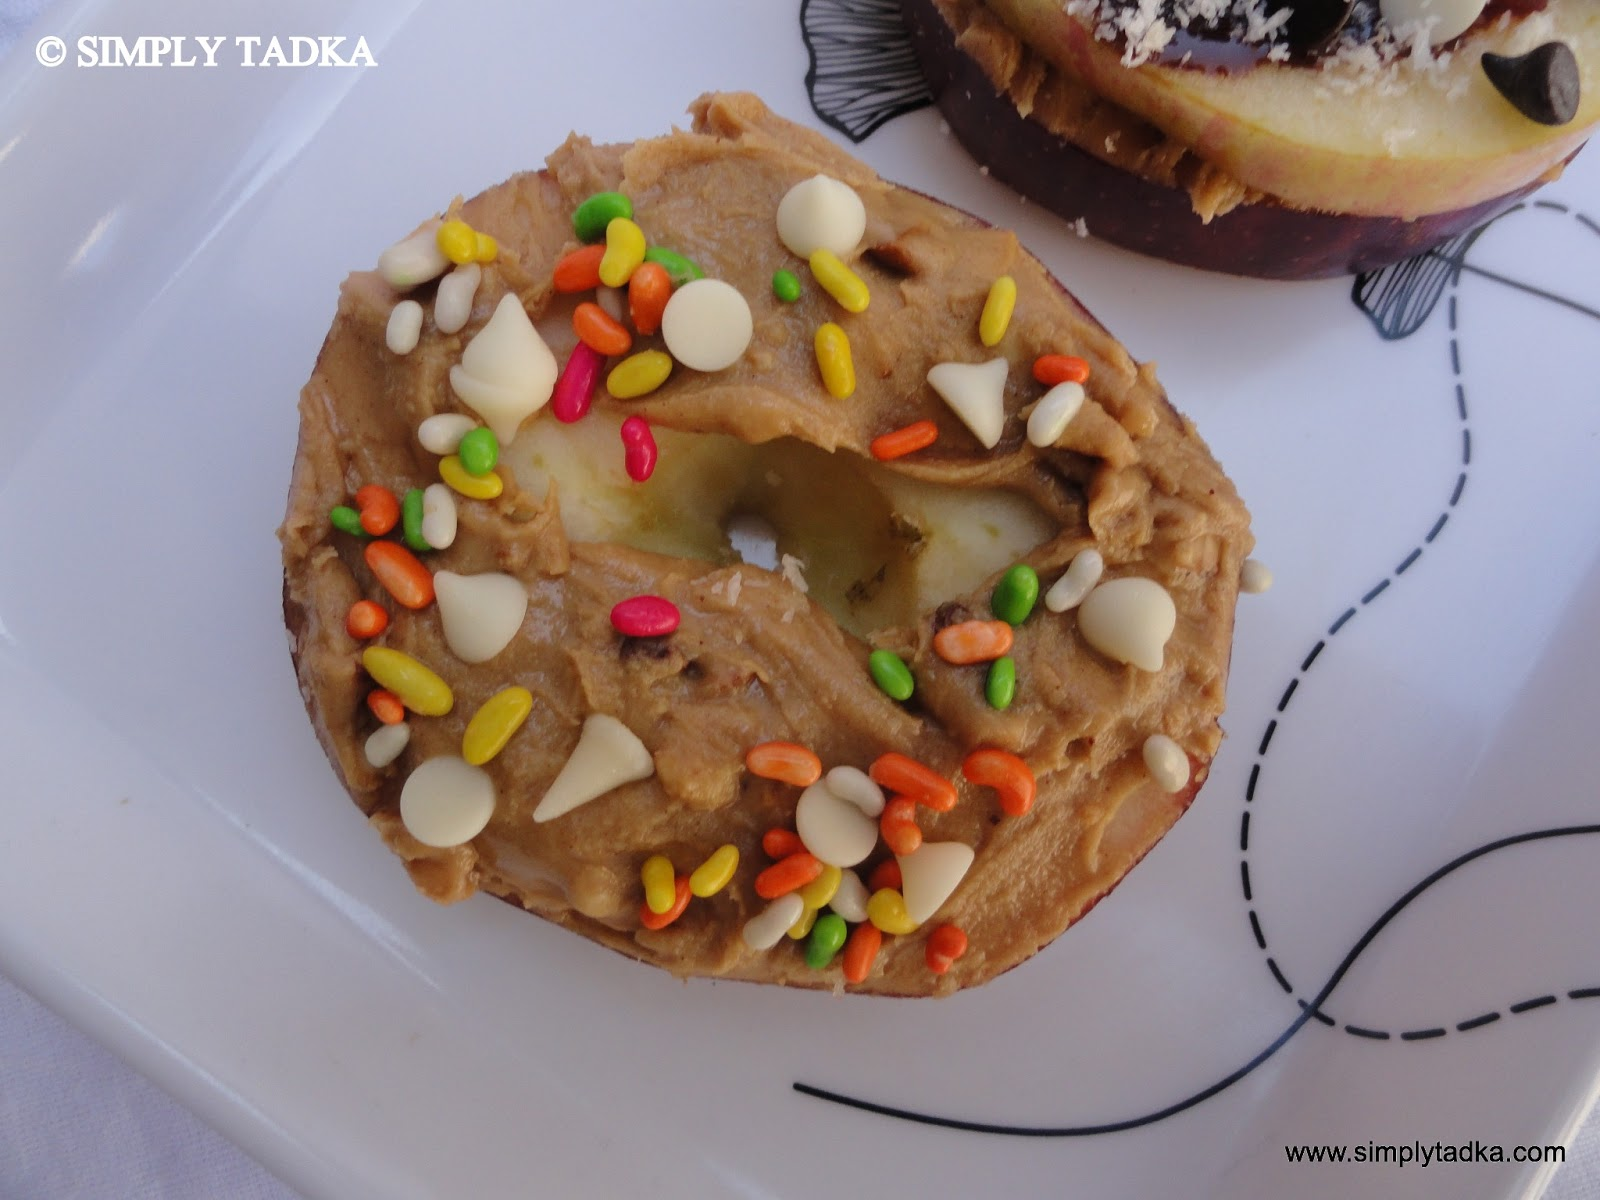 Apple Peanut Butter Sandwich ~ Simply TADKA